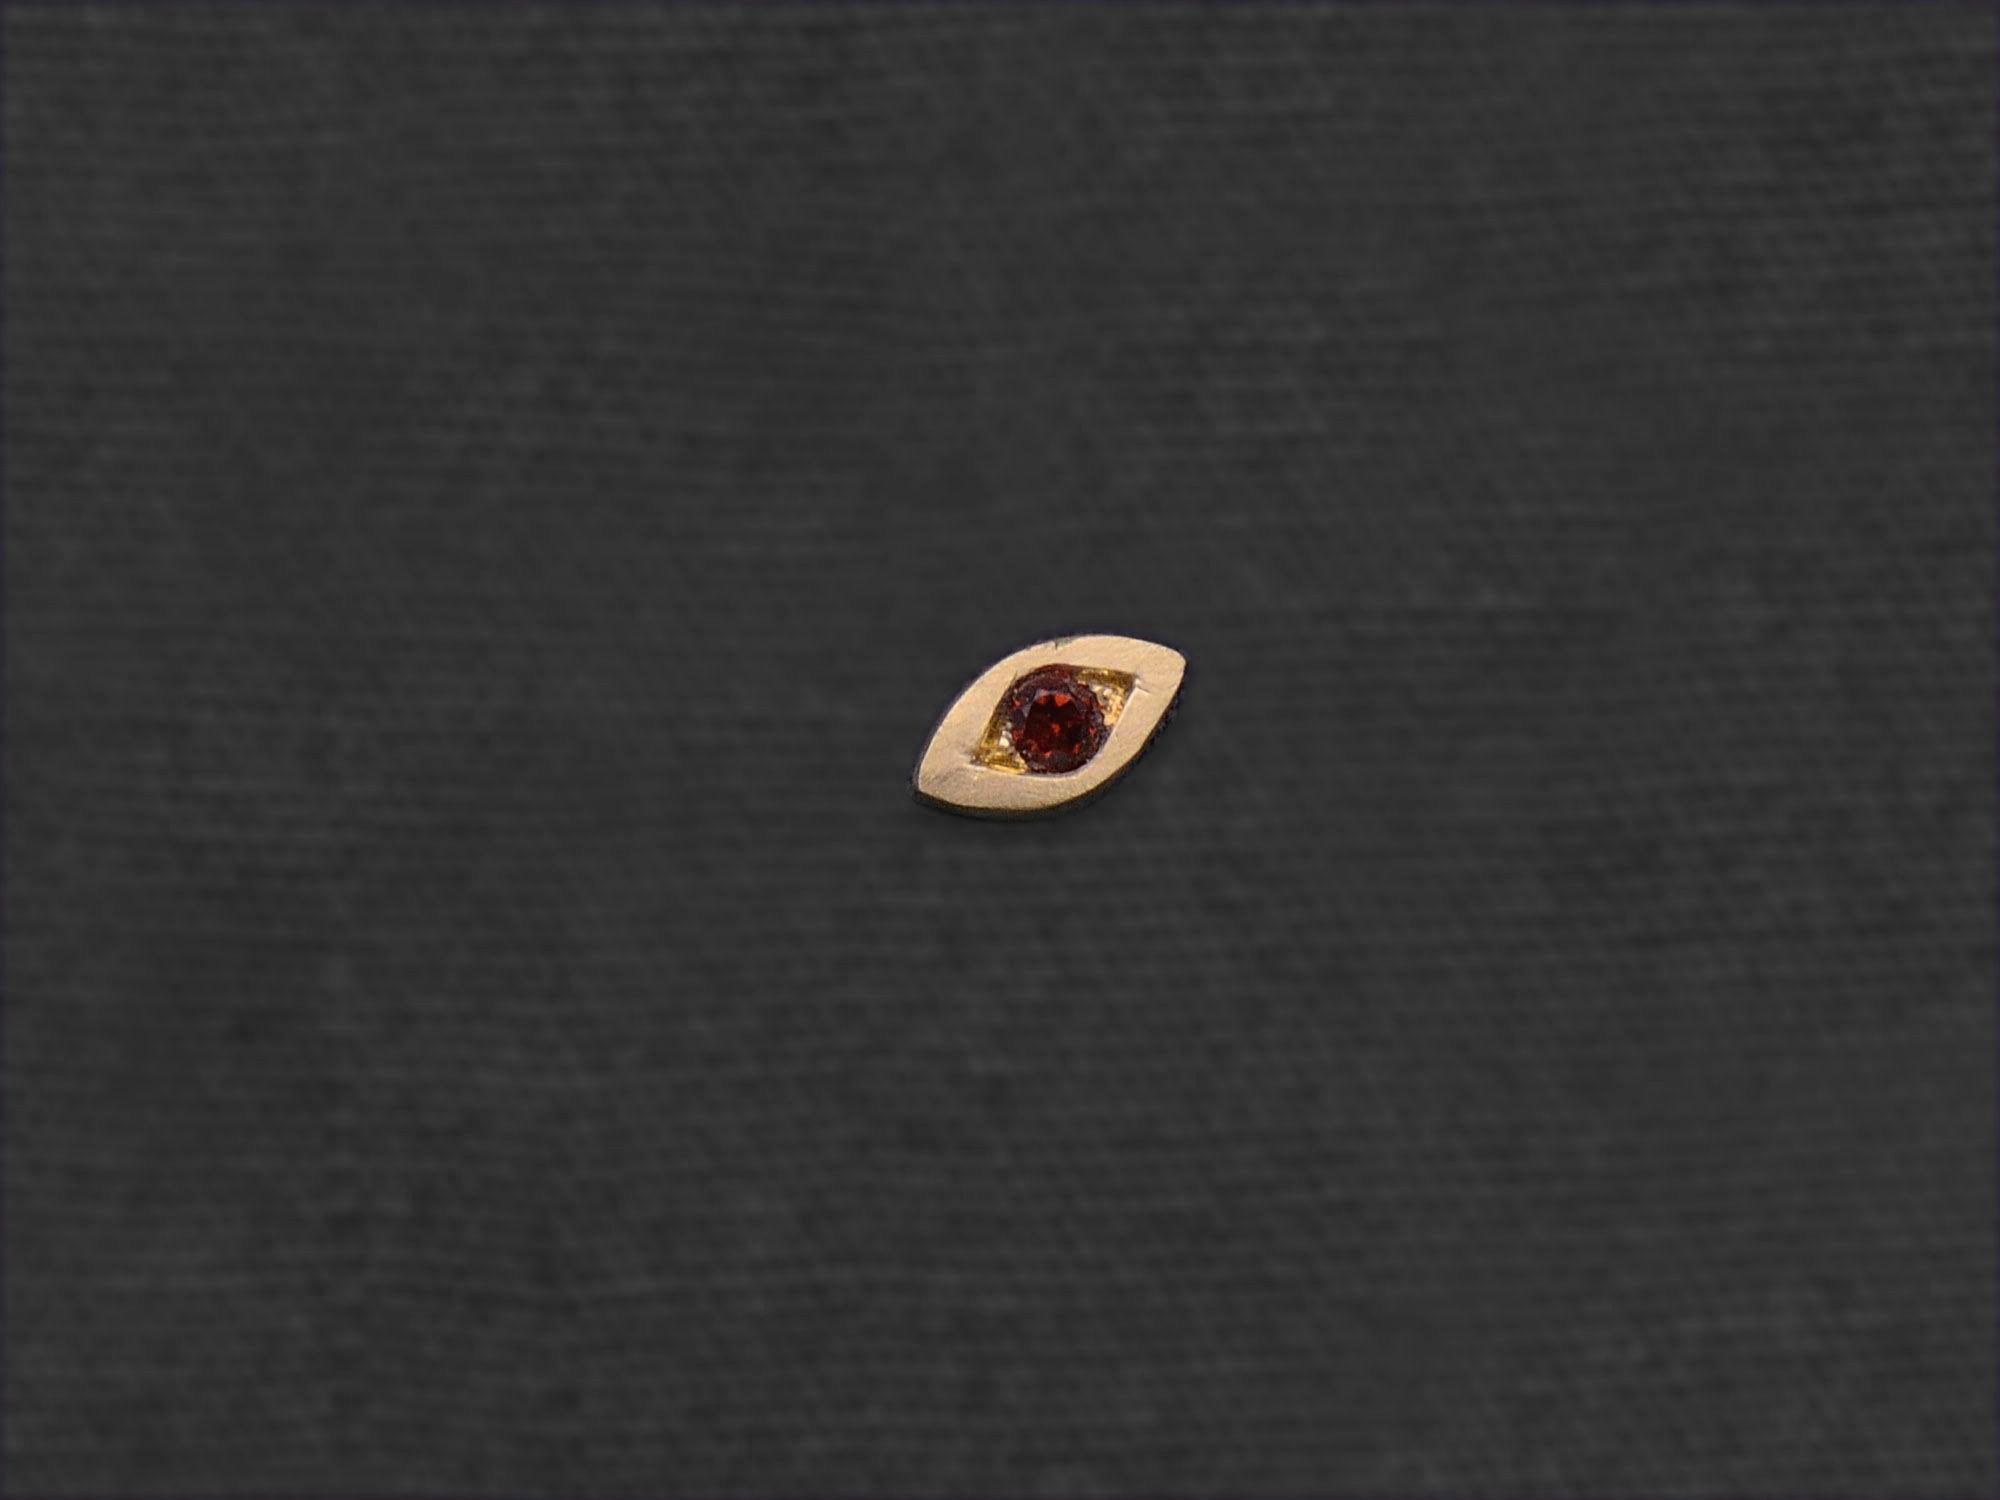 Garnet Eye mini stud earring